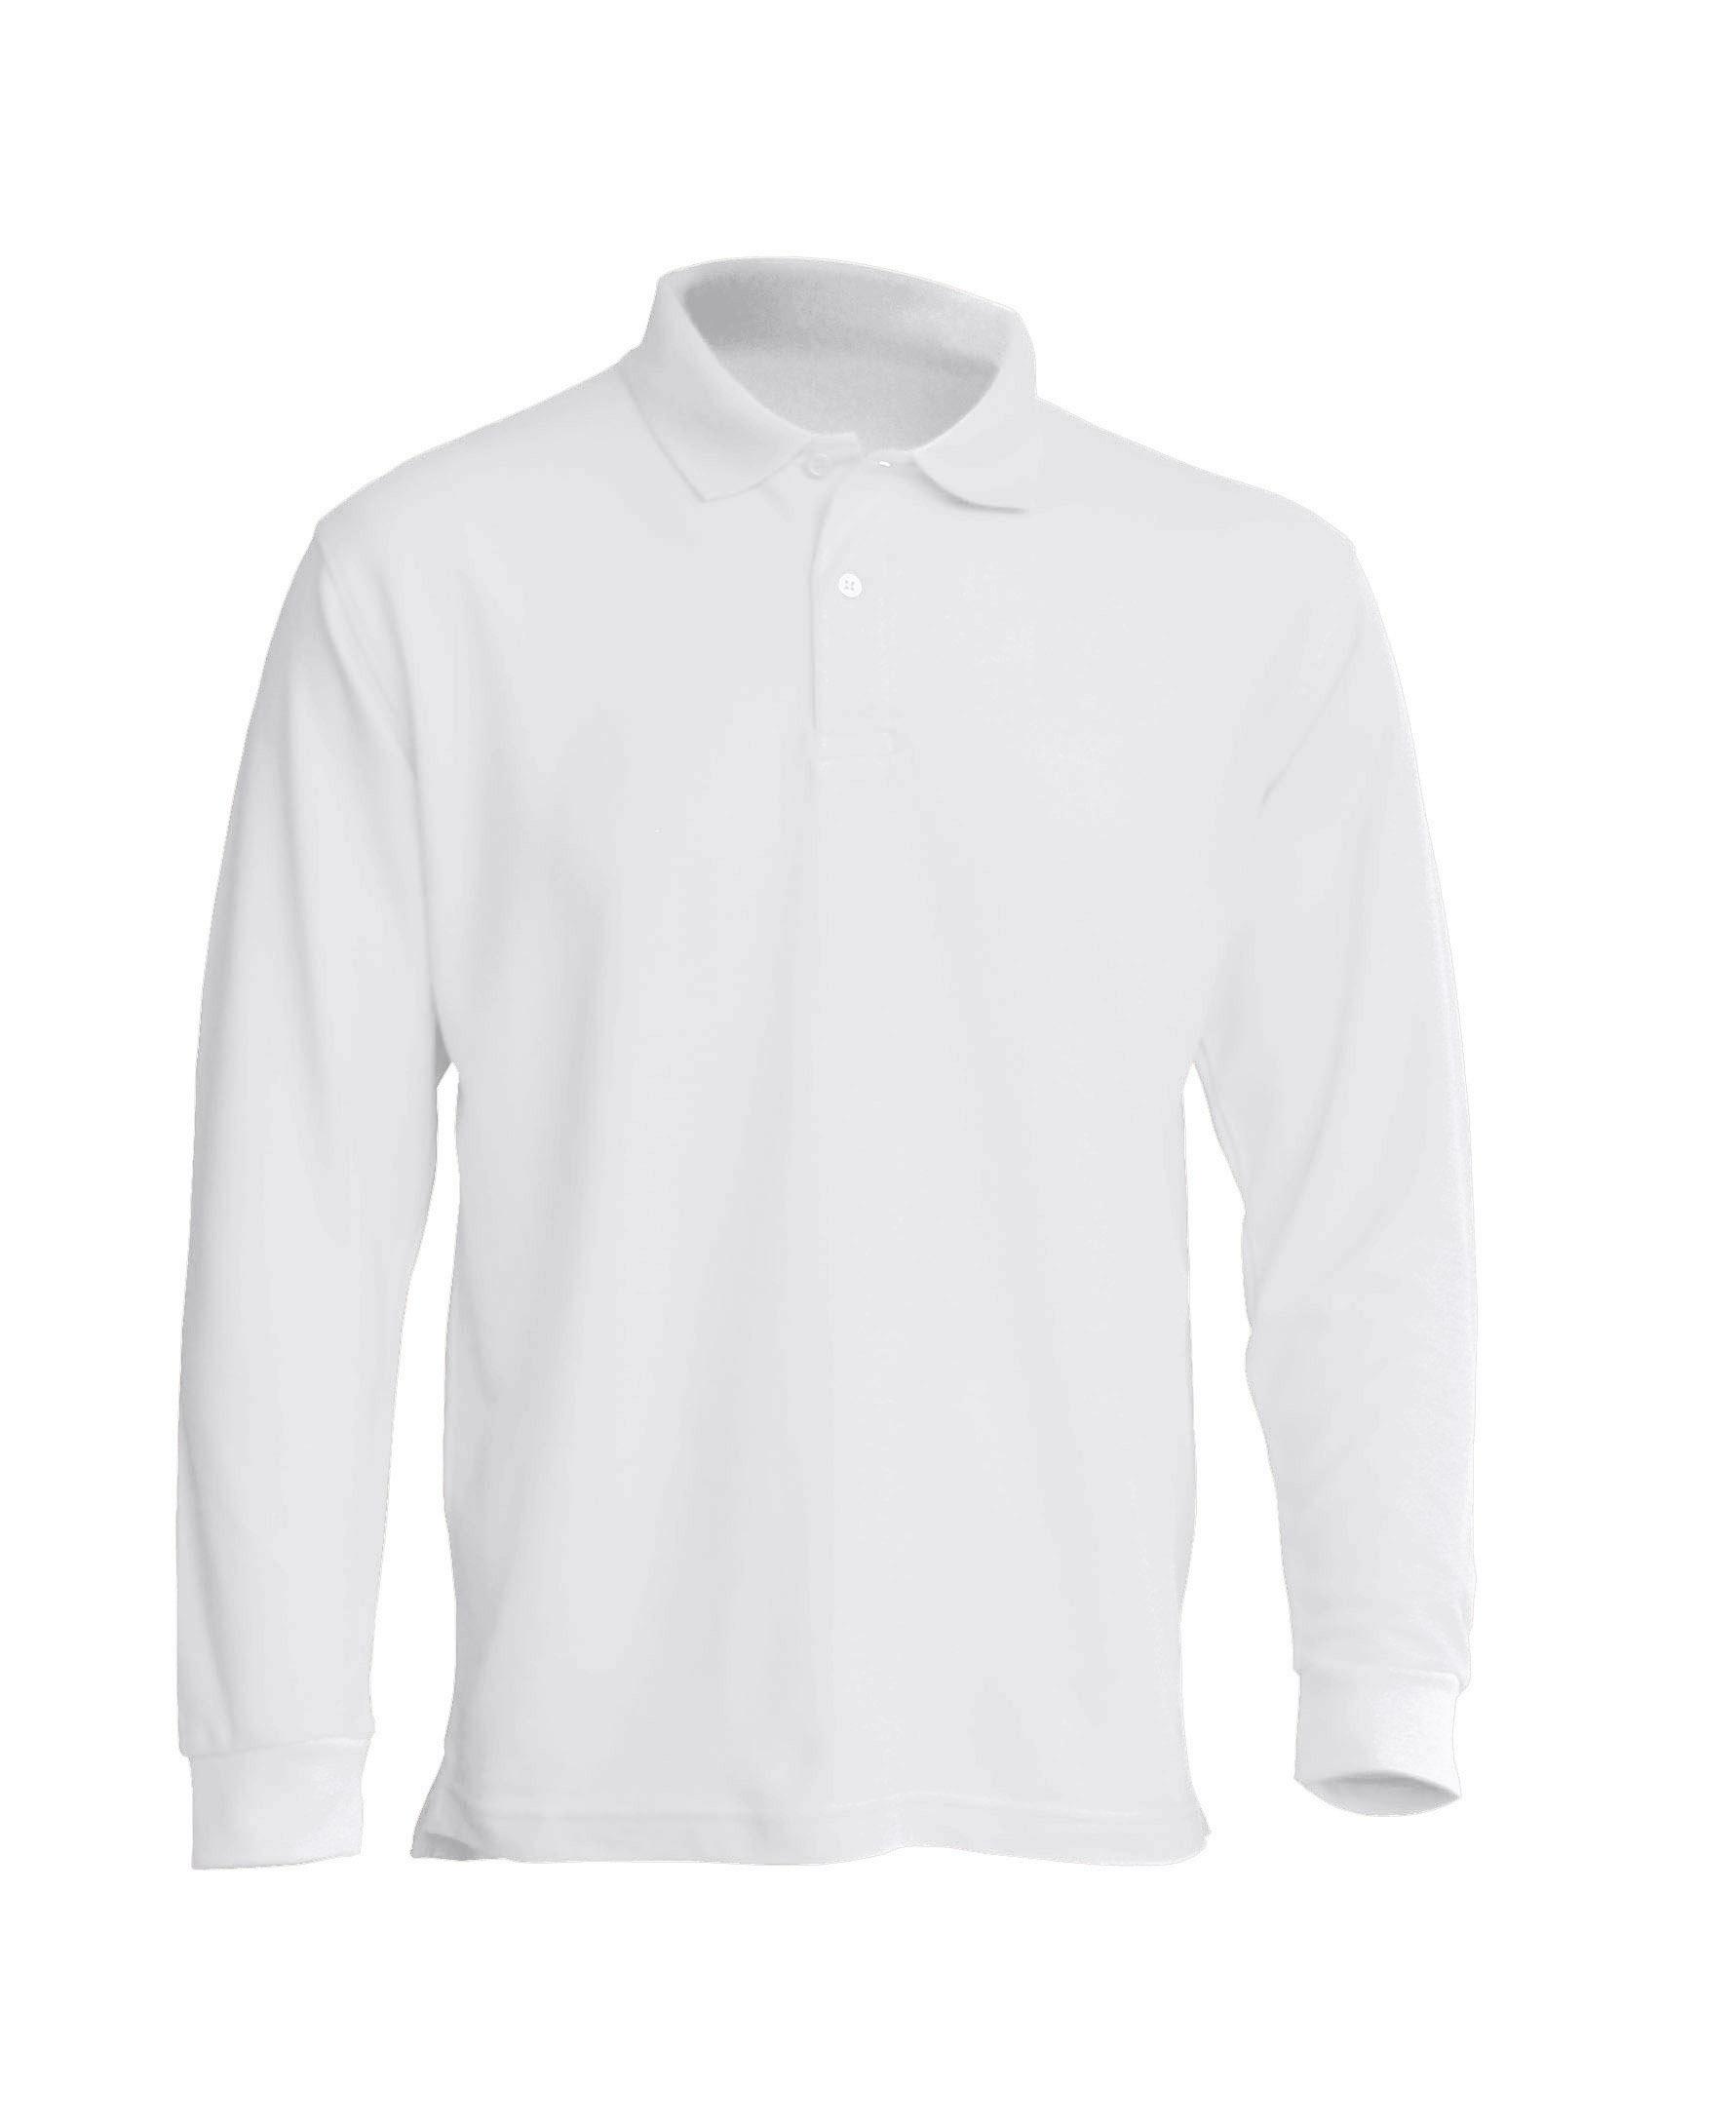 venta oficial pulcro busca lo último Polo blanco manga larga Santa Isabel